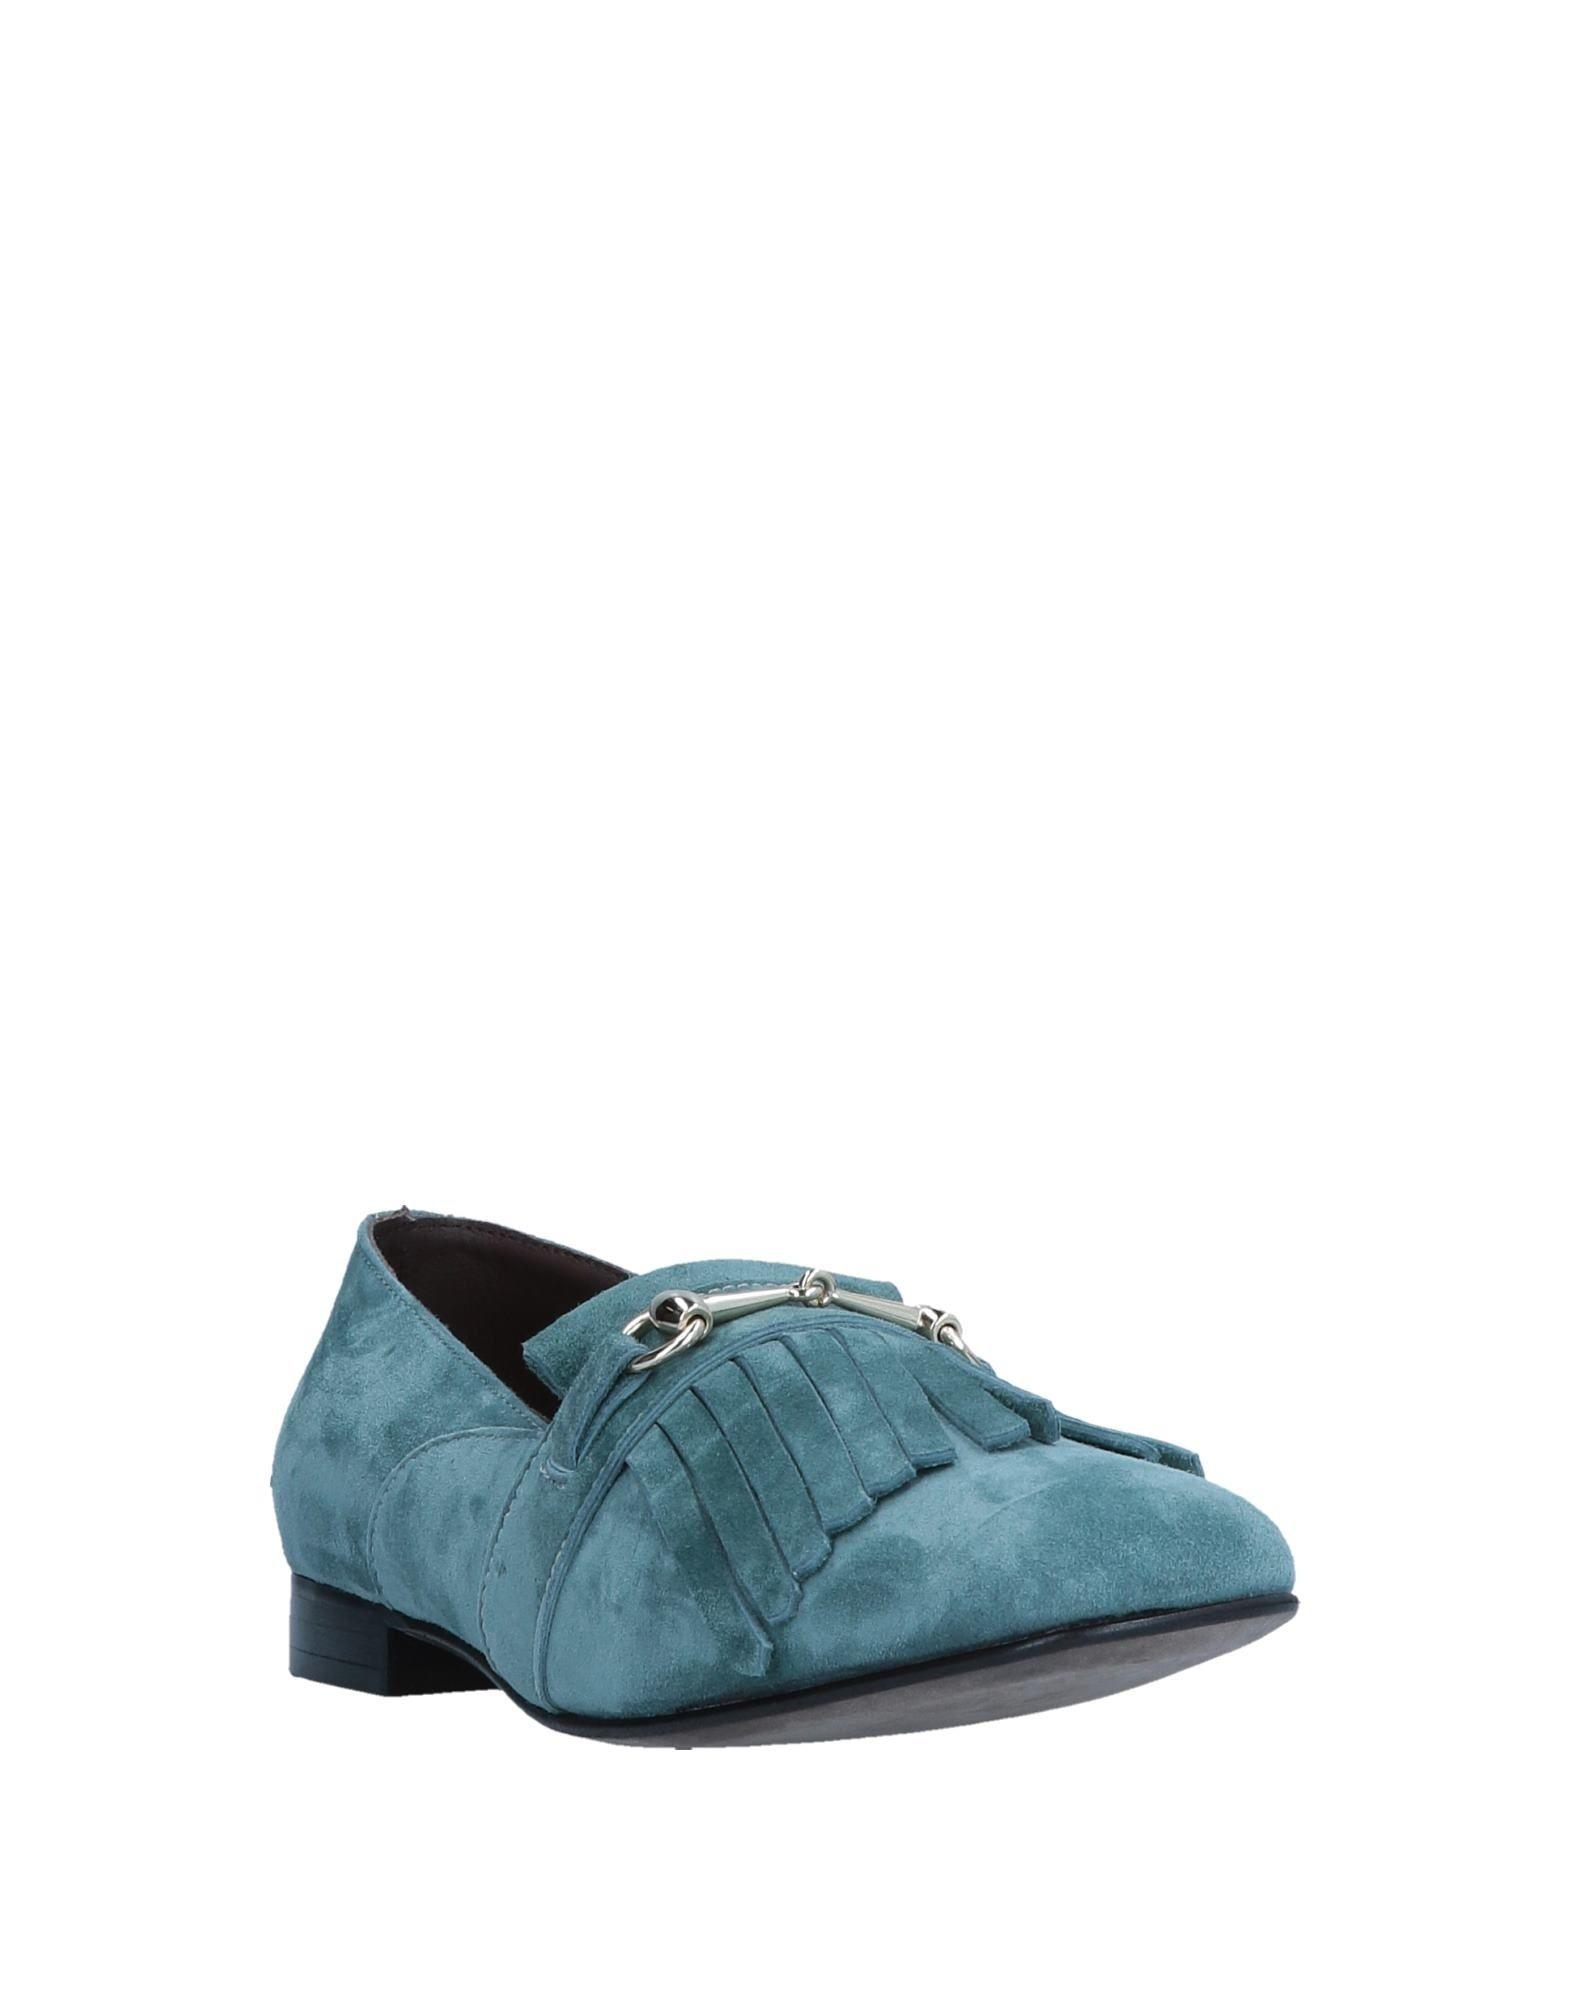 Boemos 11553445UN Mokassins Damen  11553445UN Boemos Gute Qualität beliebte Schuhe f625c6